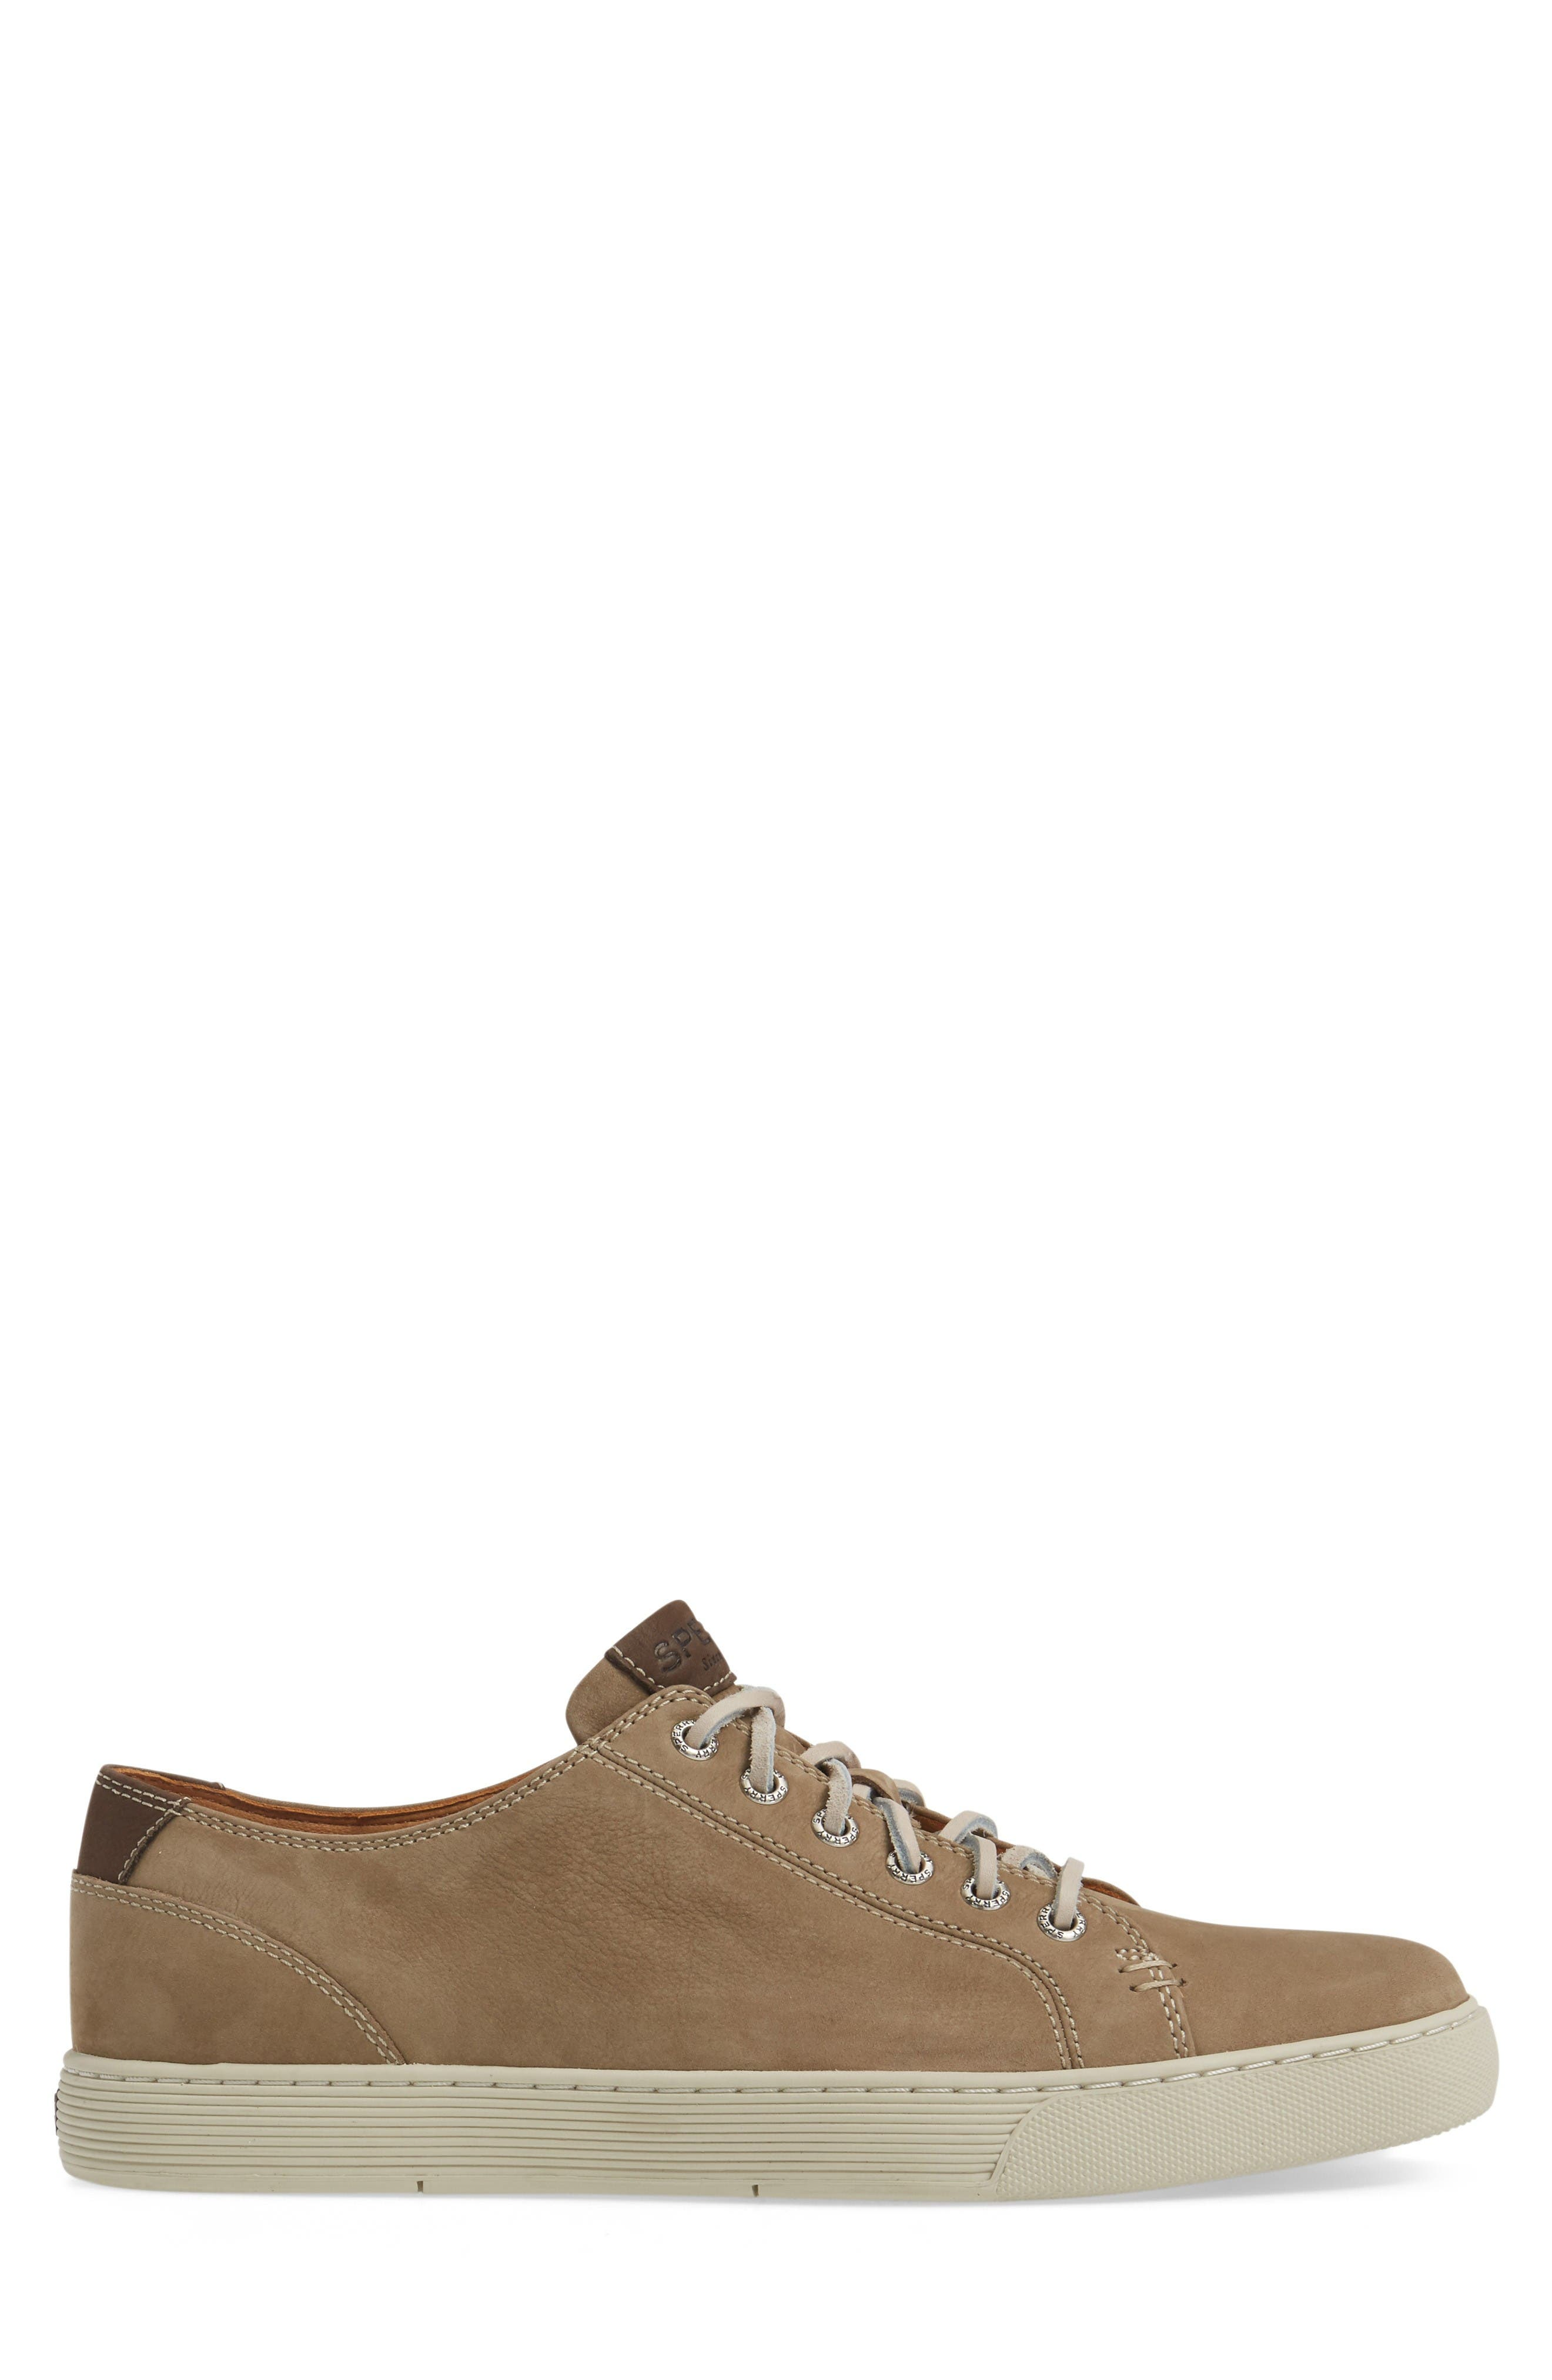 'Gold Cup - LTT' Sneaker (Men)',                             Alternate thumbnail 3, color,                             Taupe Suede